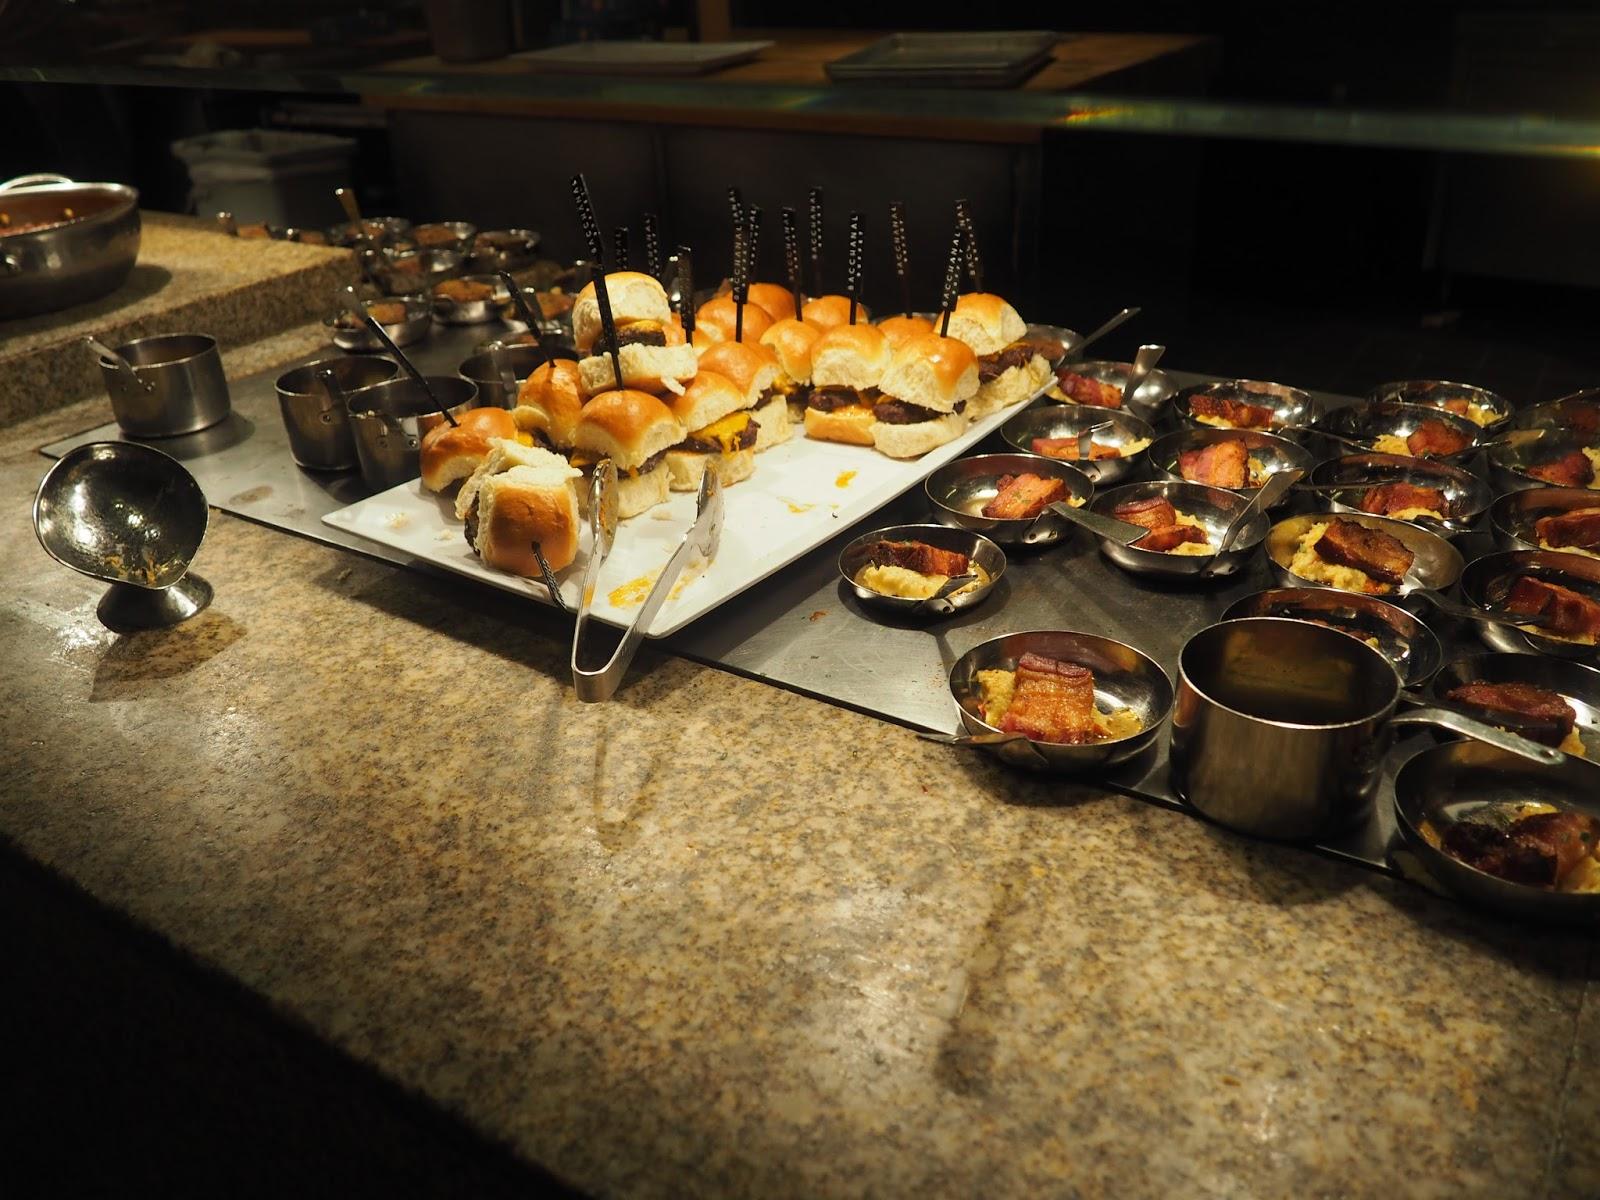 Burgers at Baachanal Buffet at Caesar's Palace, Las Vegas